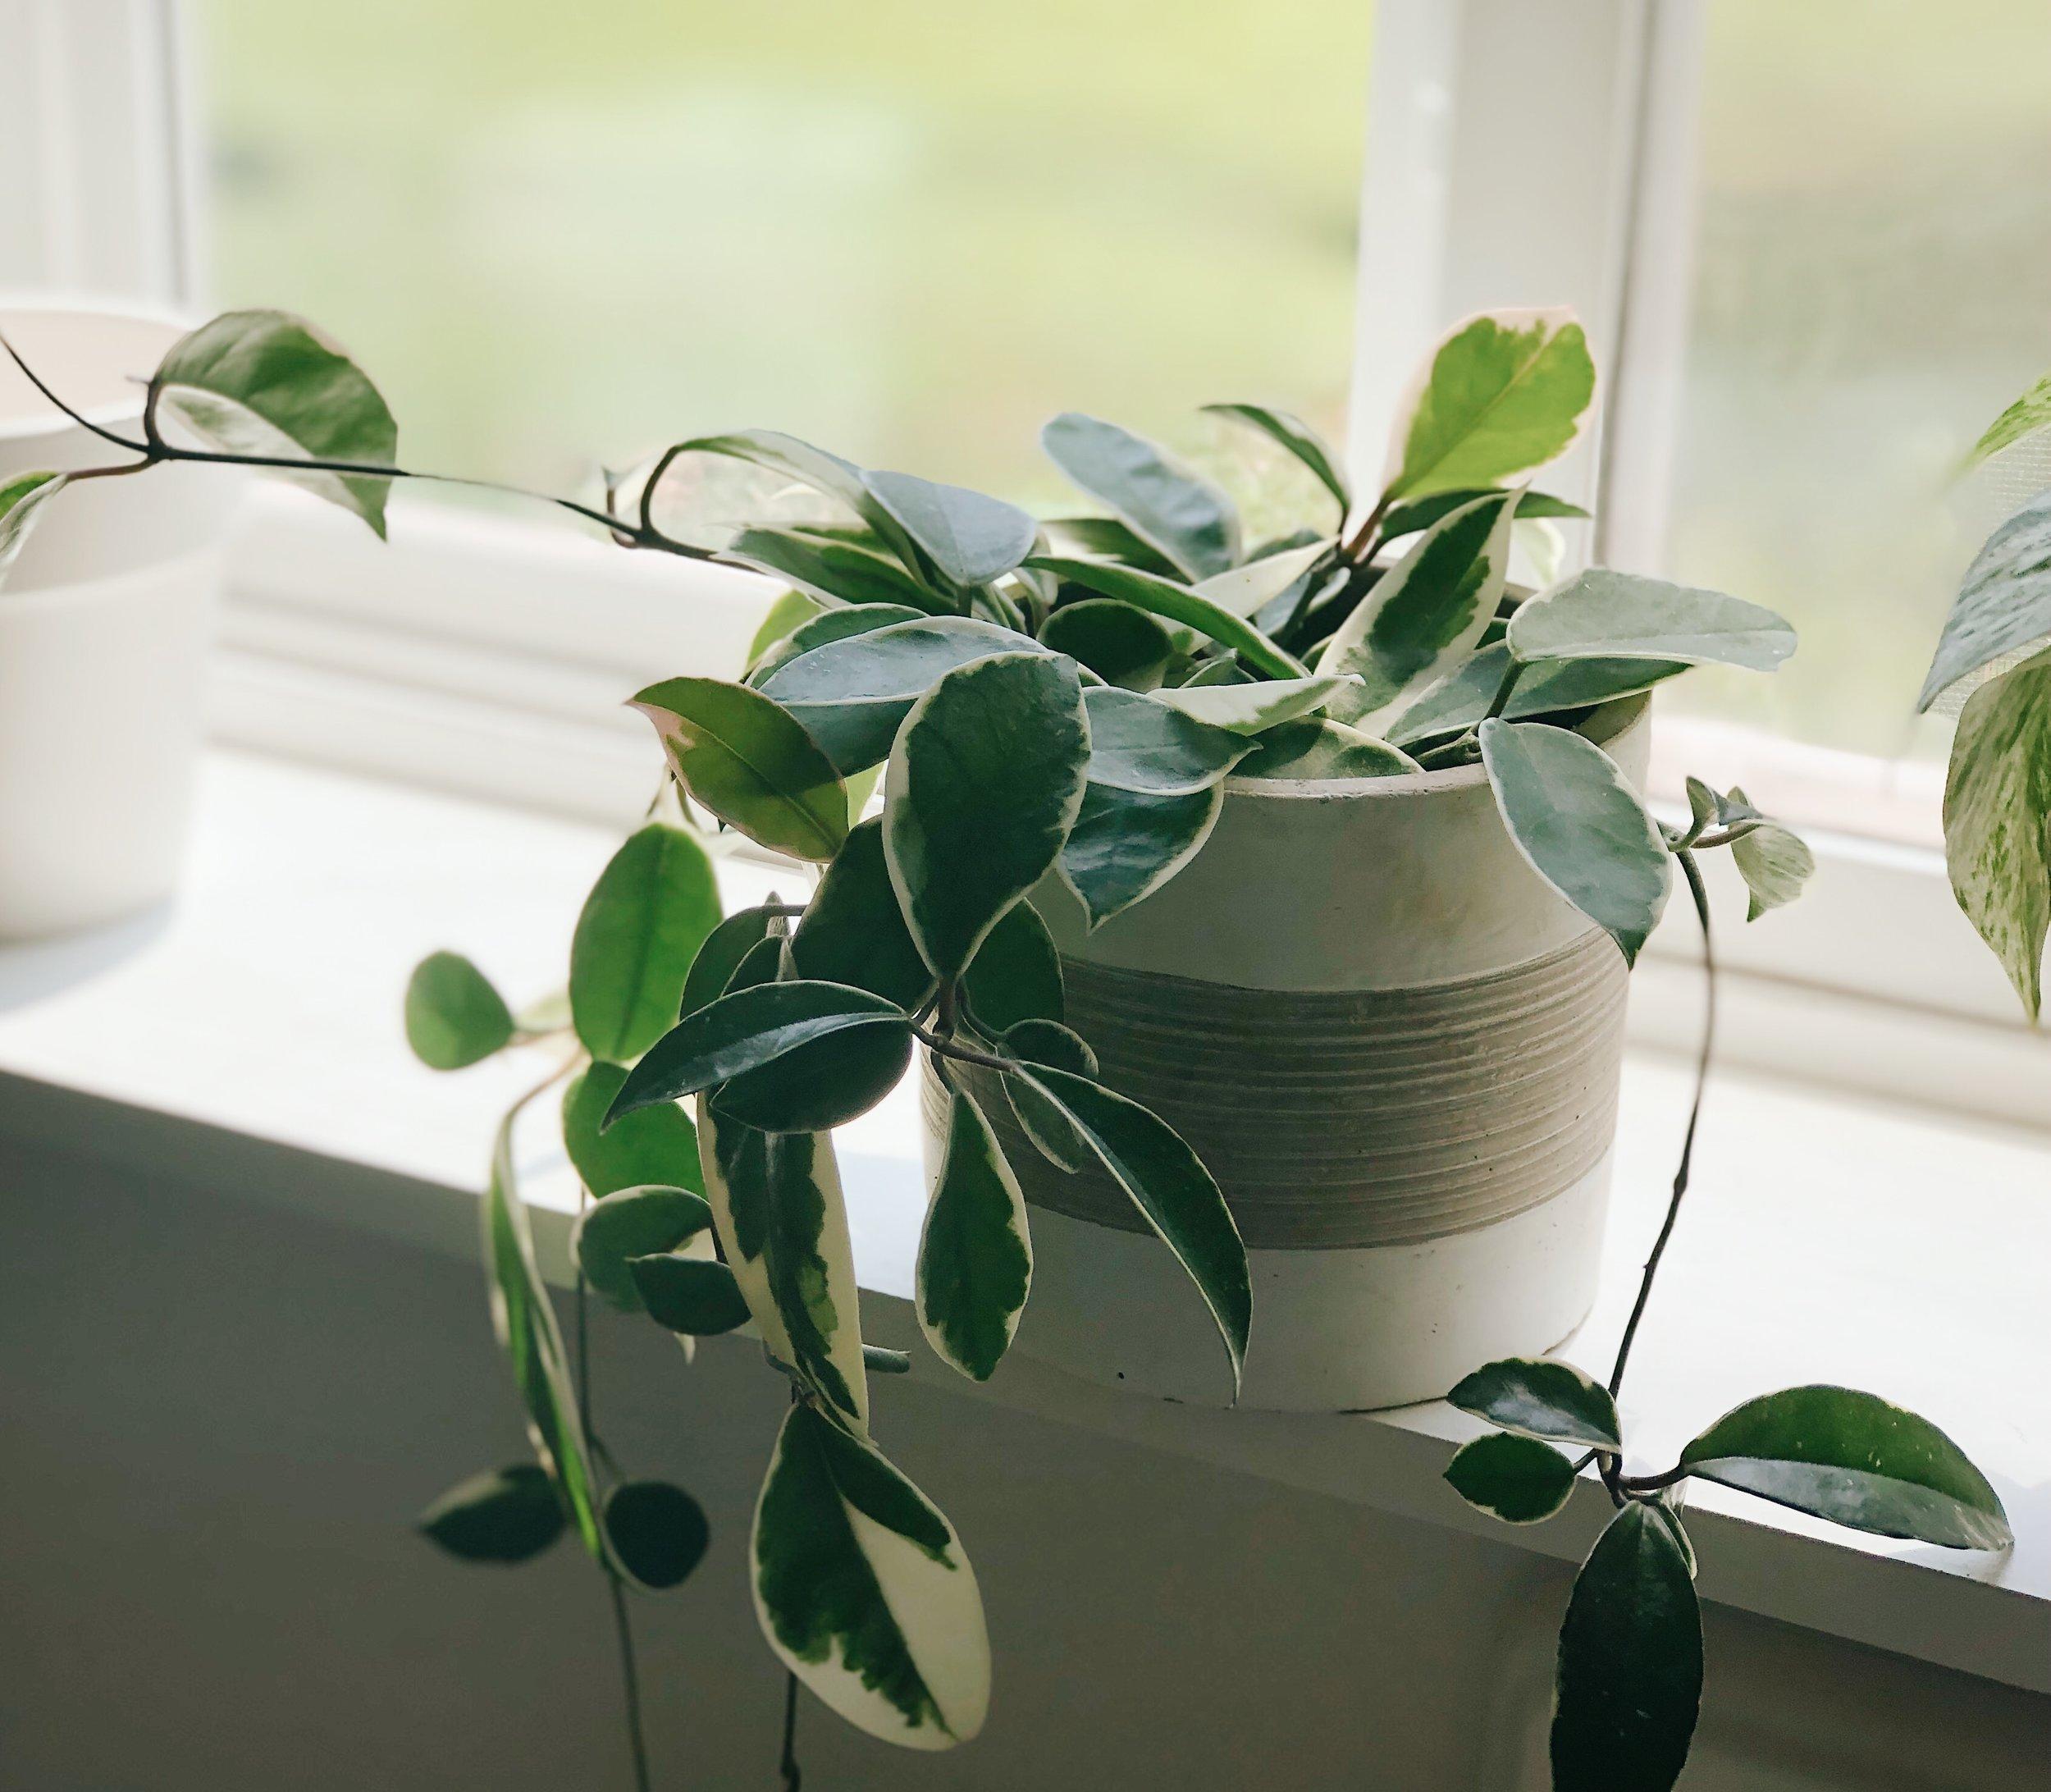 hoya vine on white windowsill